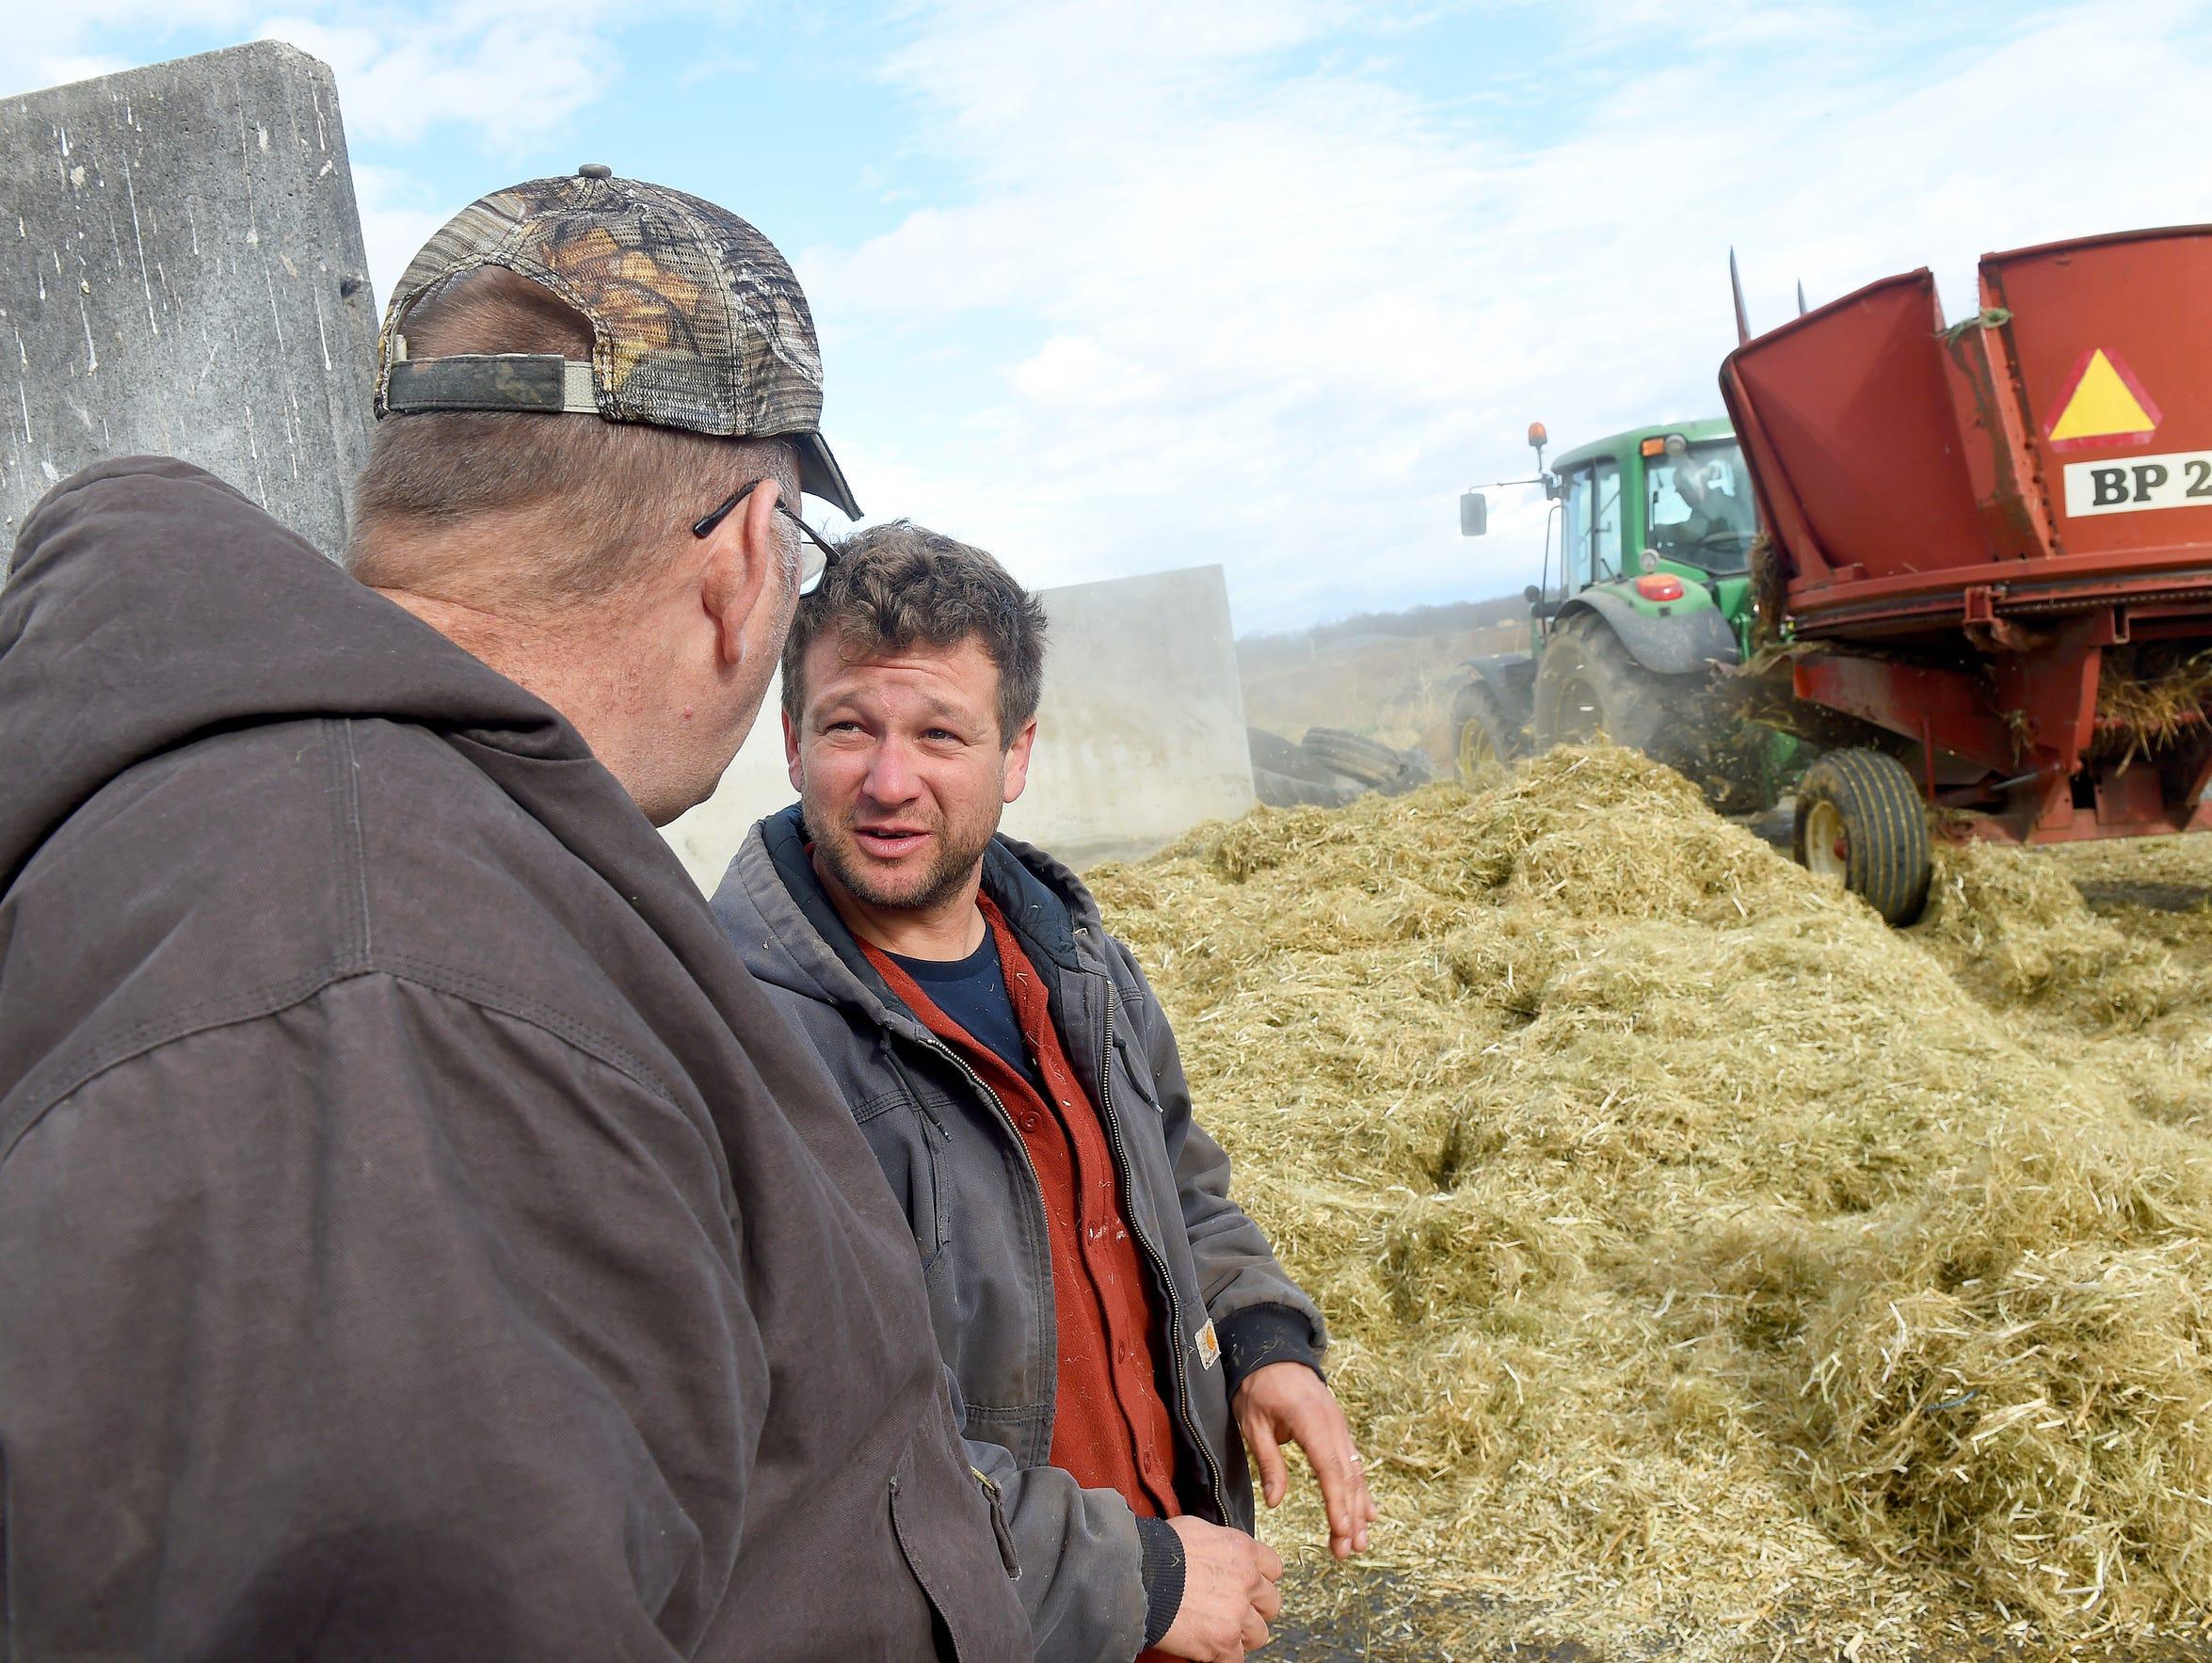 Farmer Glenn Rodes of Port Republic talks with fellow